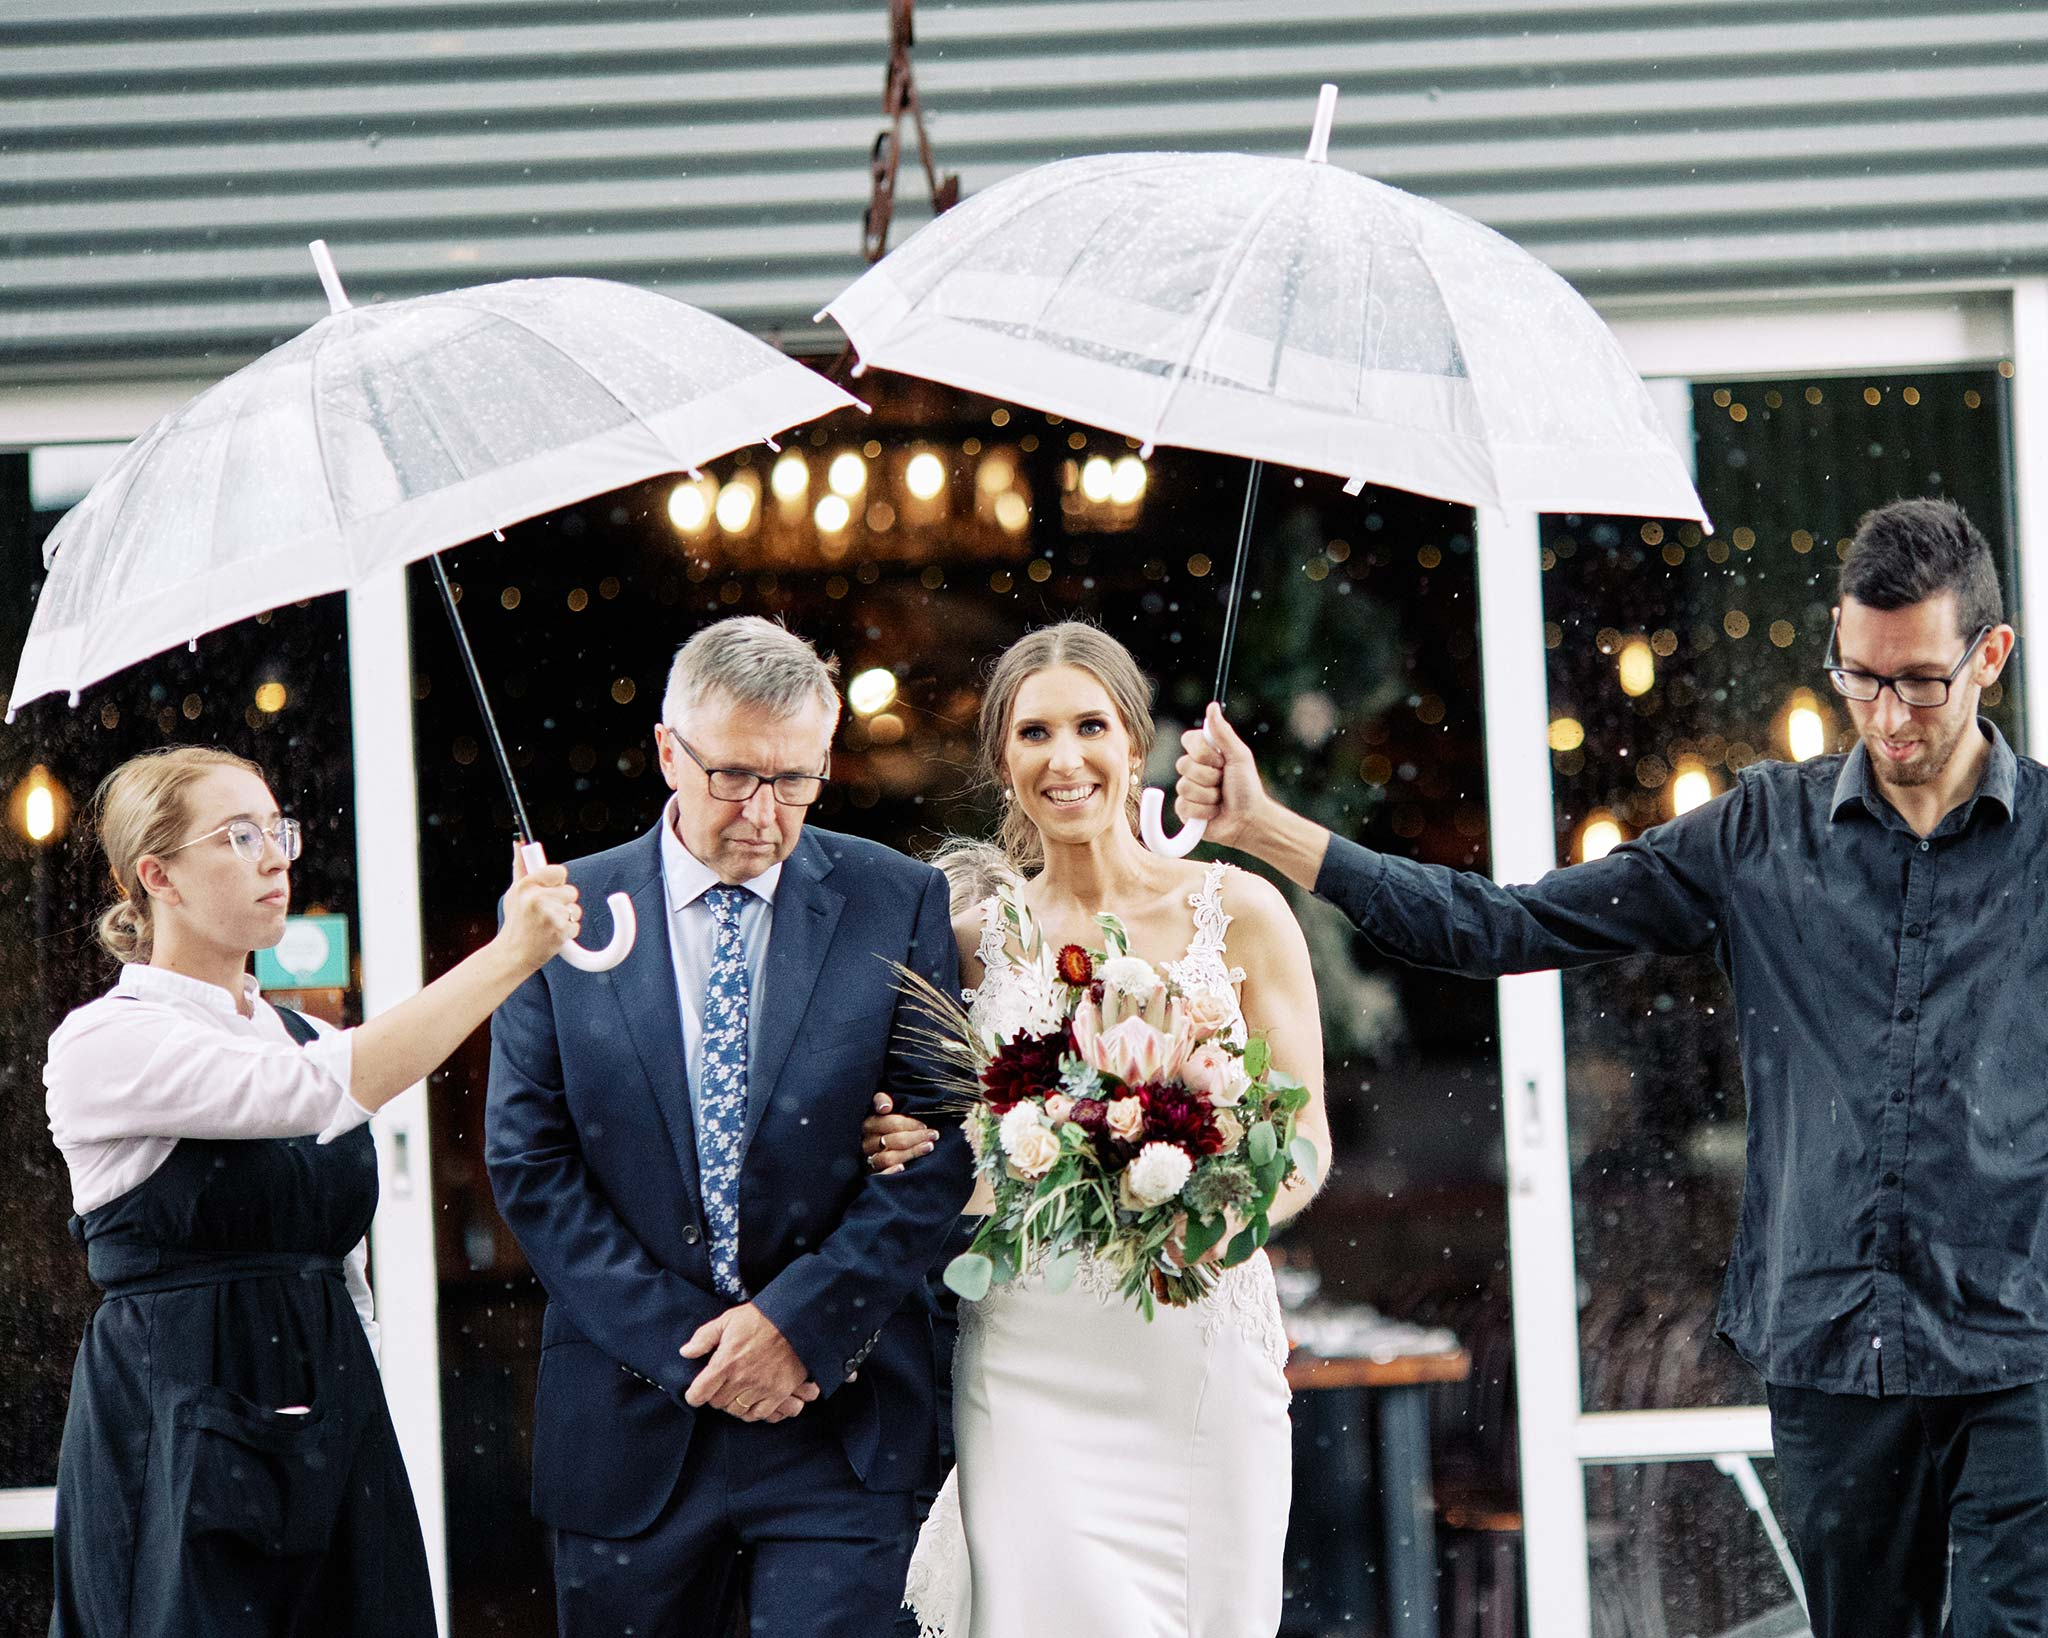 Zonzo estate wedding bridal entrance